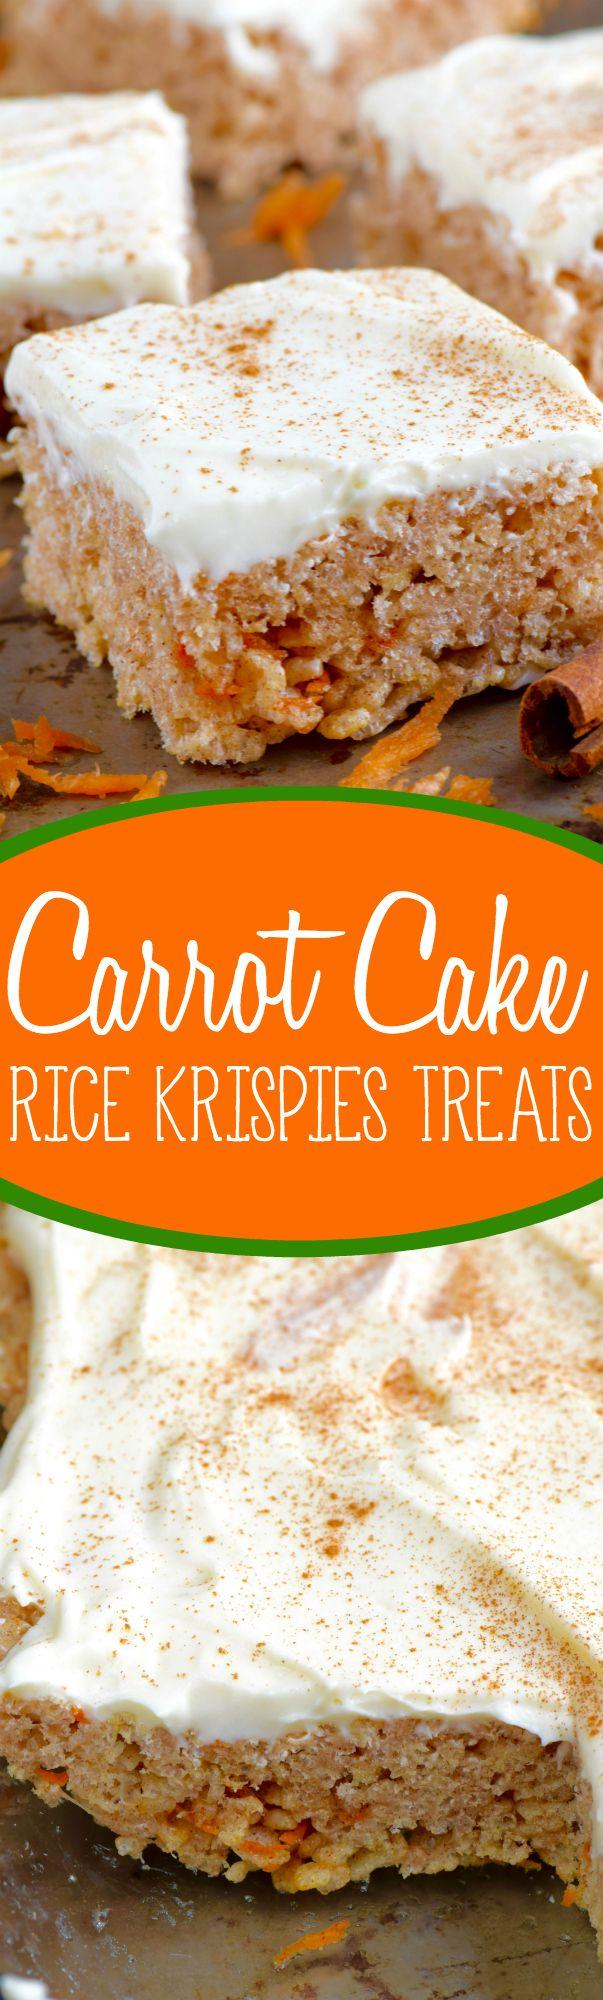 Home handmade candies chocolate dipped rice krispy treats 2 - Carrot Cake Rice Krispies Treats